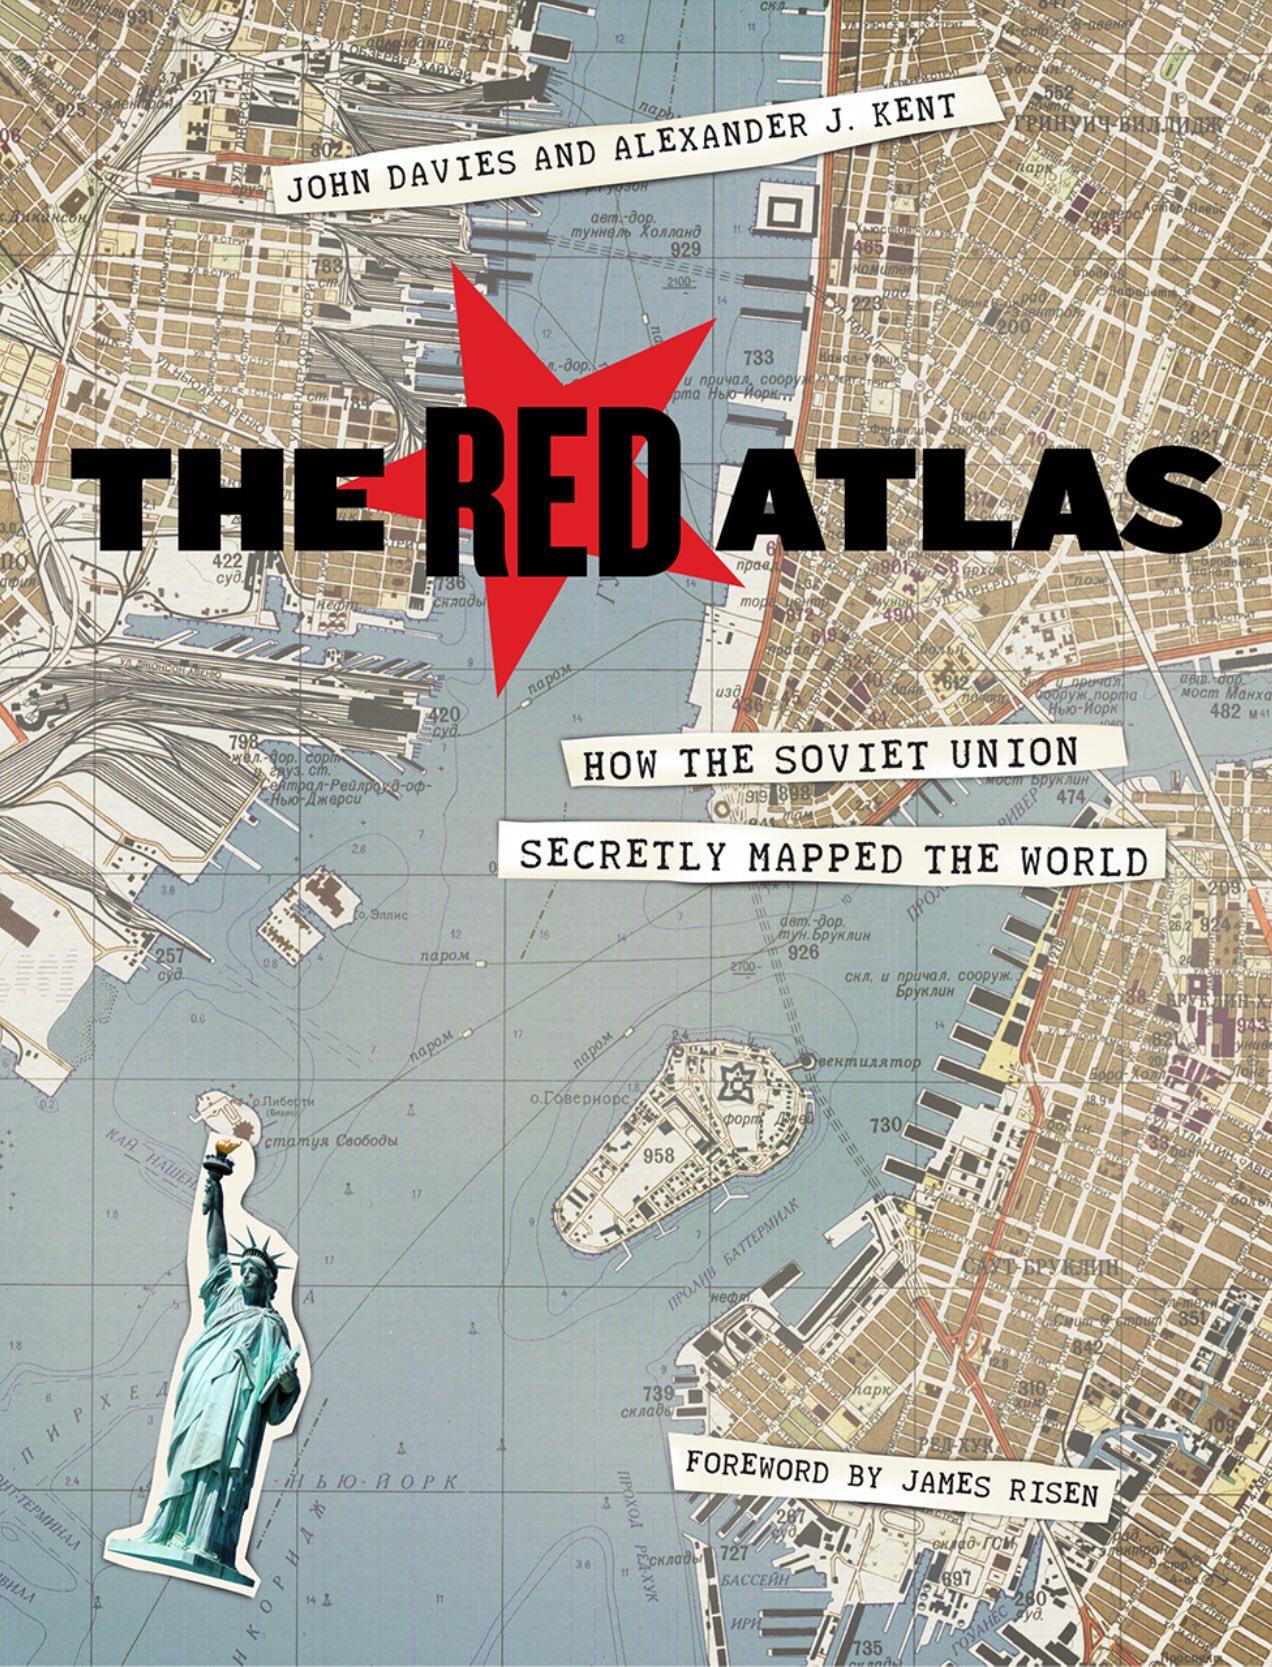 O Kόκκινος Ατλας των Σοβιετικών που είχαν χαρτογραφήσει λεπτομερώς πολλές πόλεις στον κόσμο